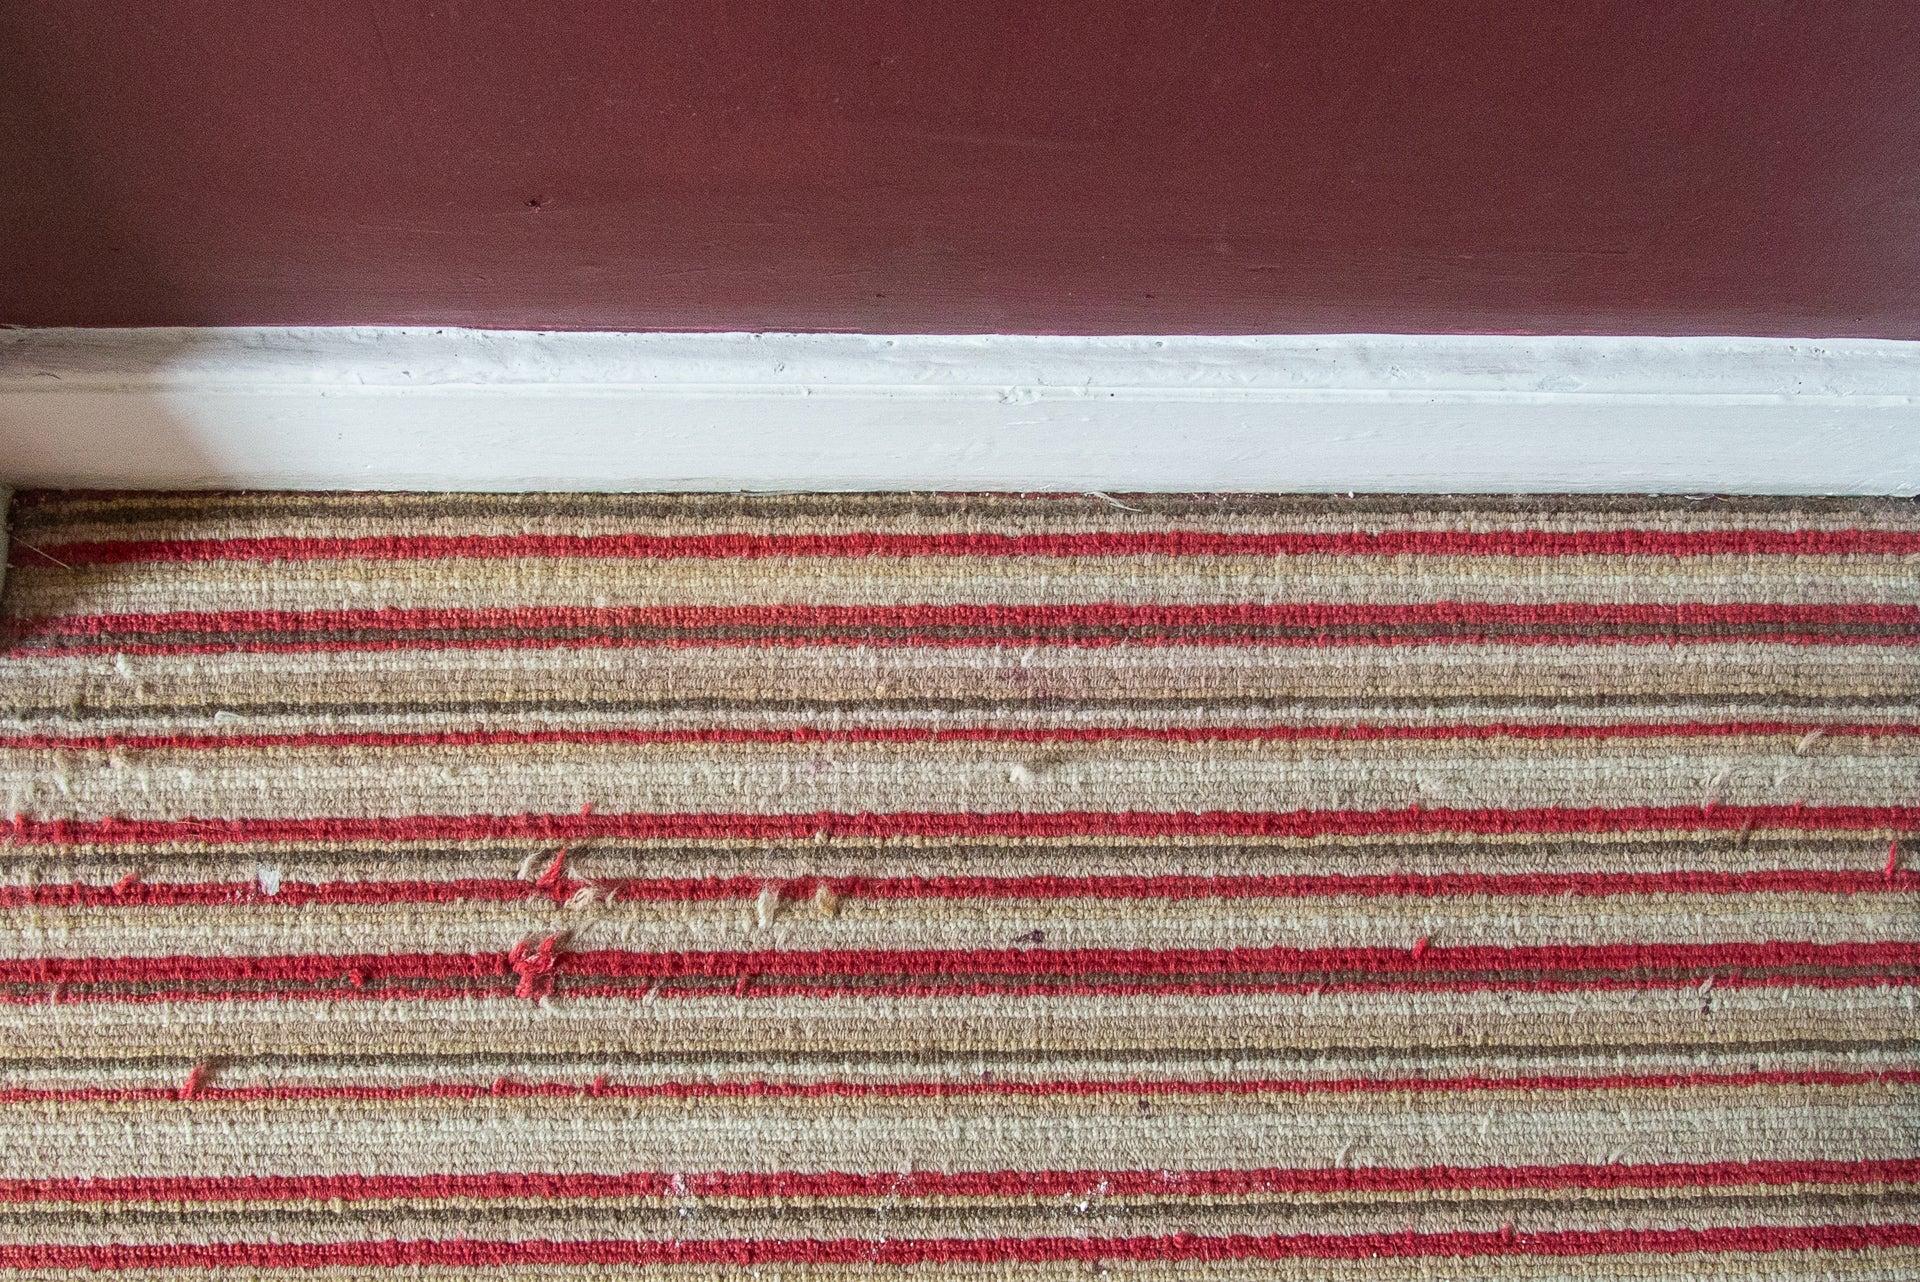 Vorwerk Kobold VB100 clean carpet